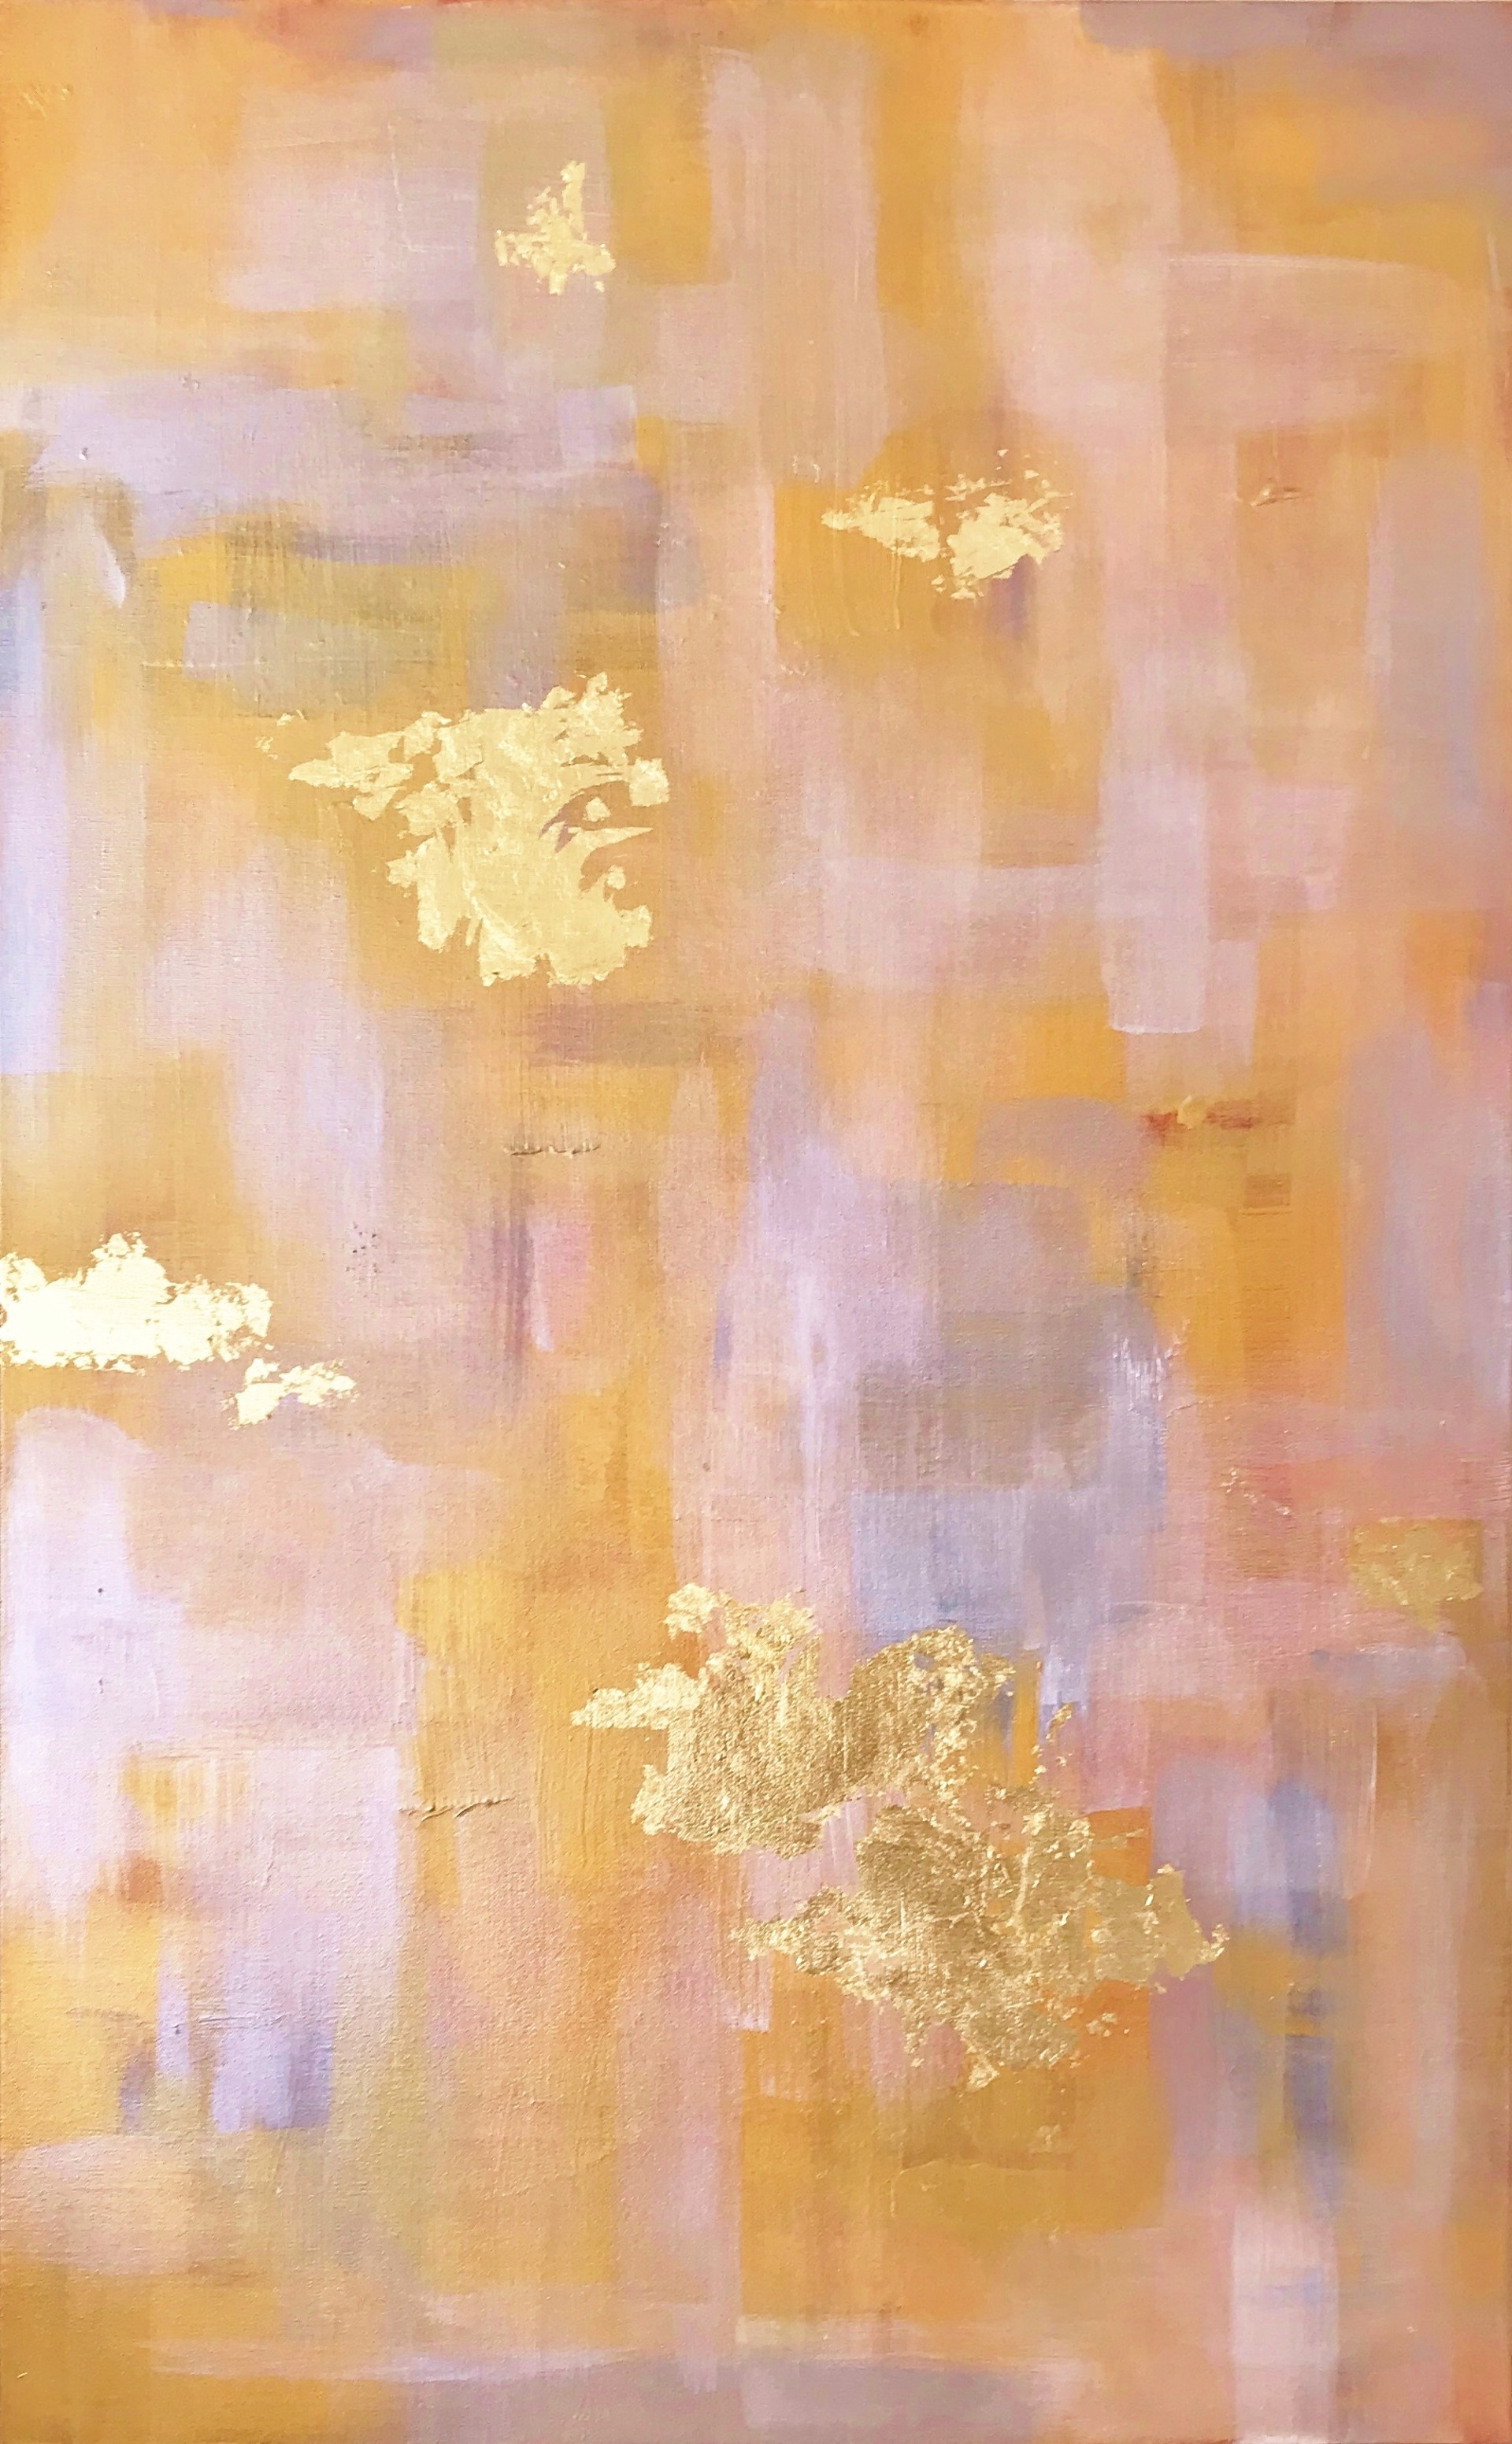 Beauty No. 17 by Leslie Poteet Busker